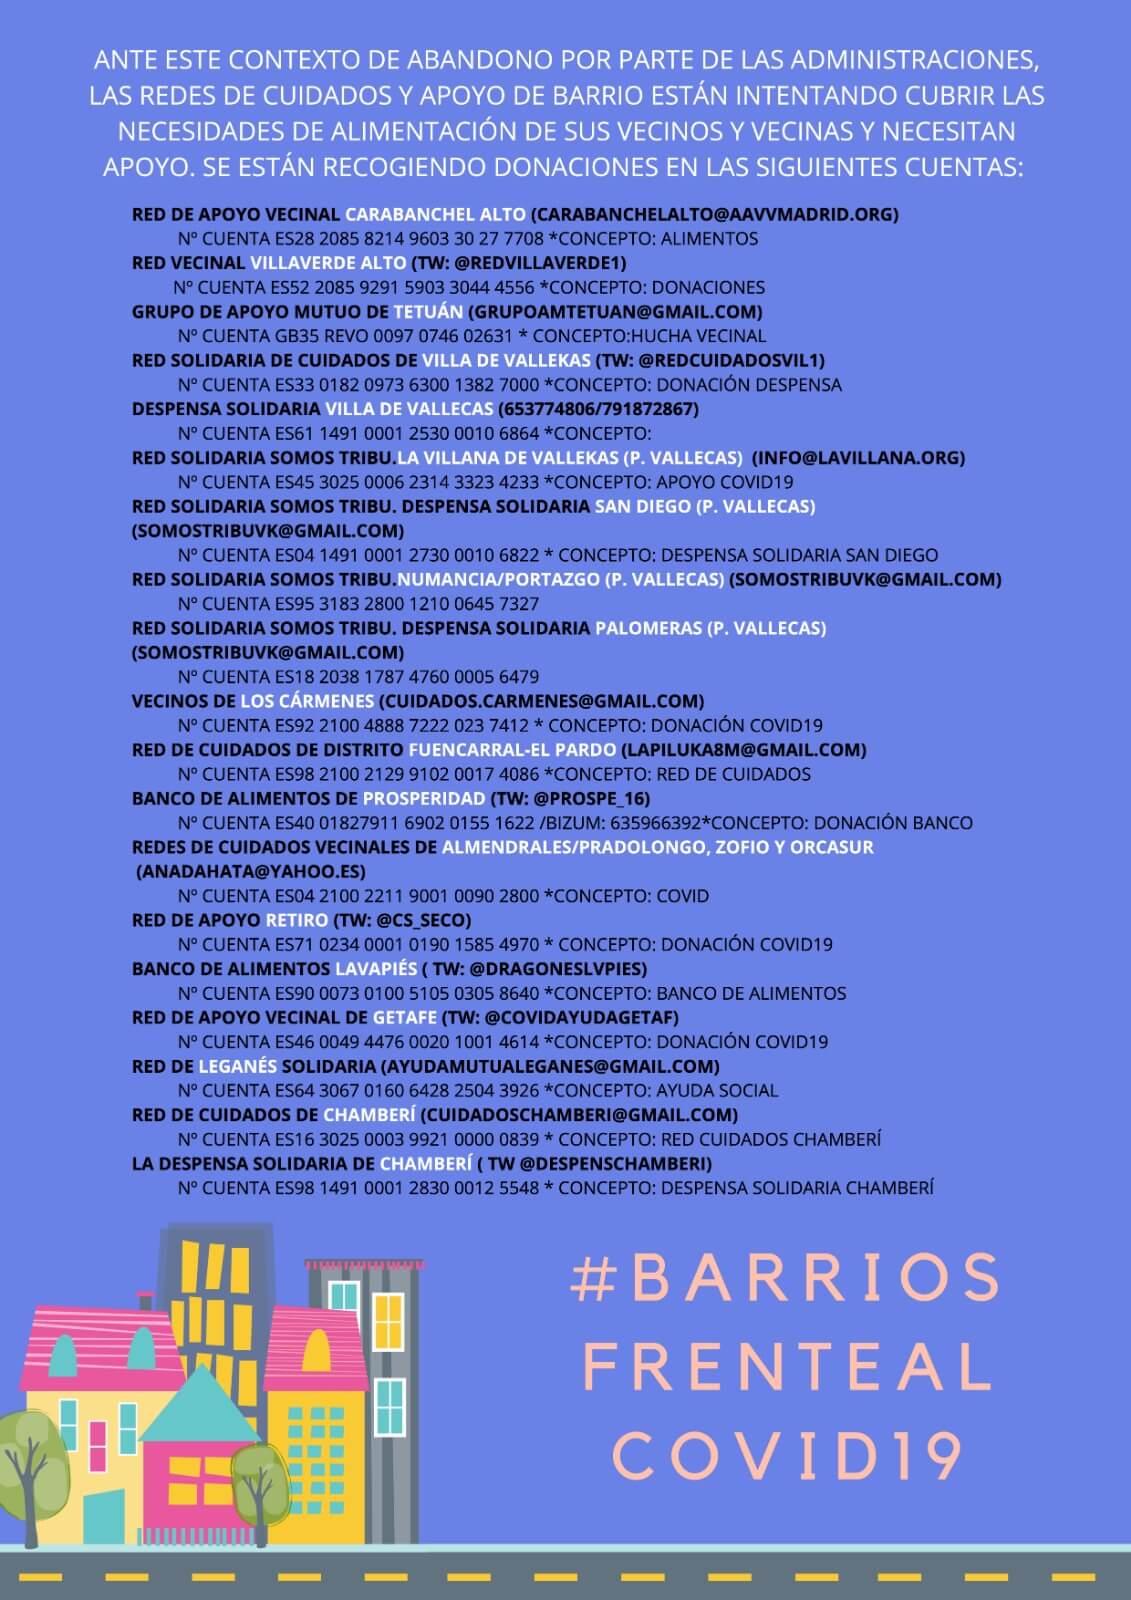 barrios-frente-covid19